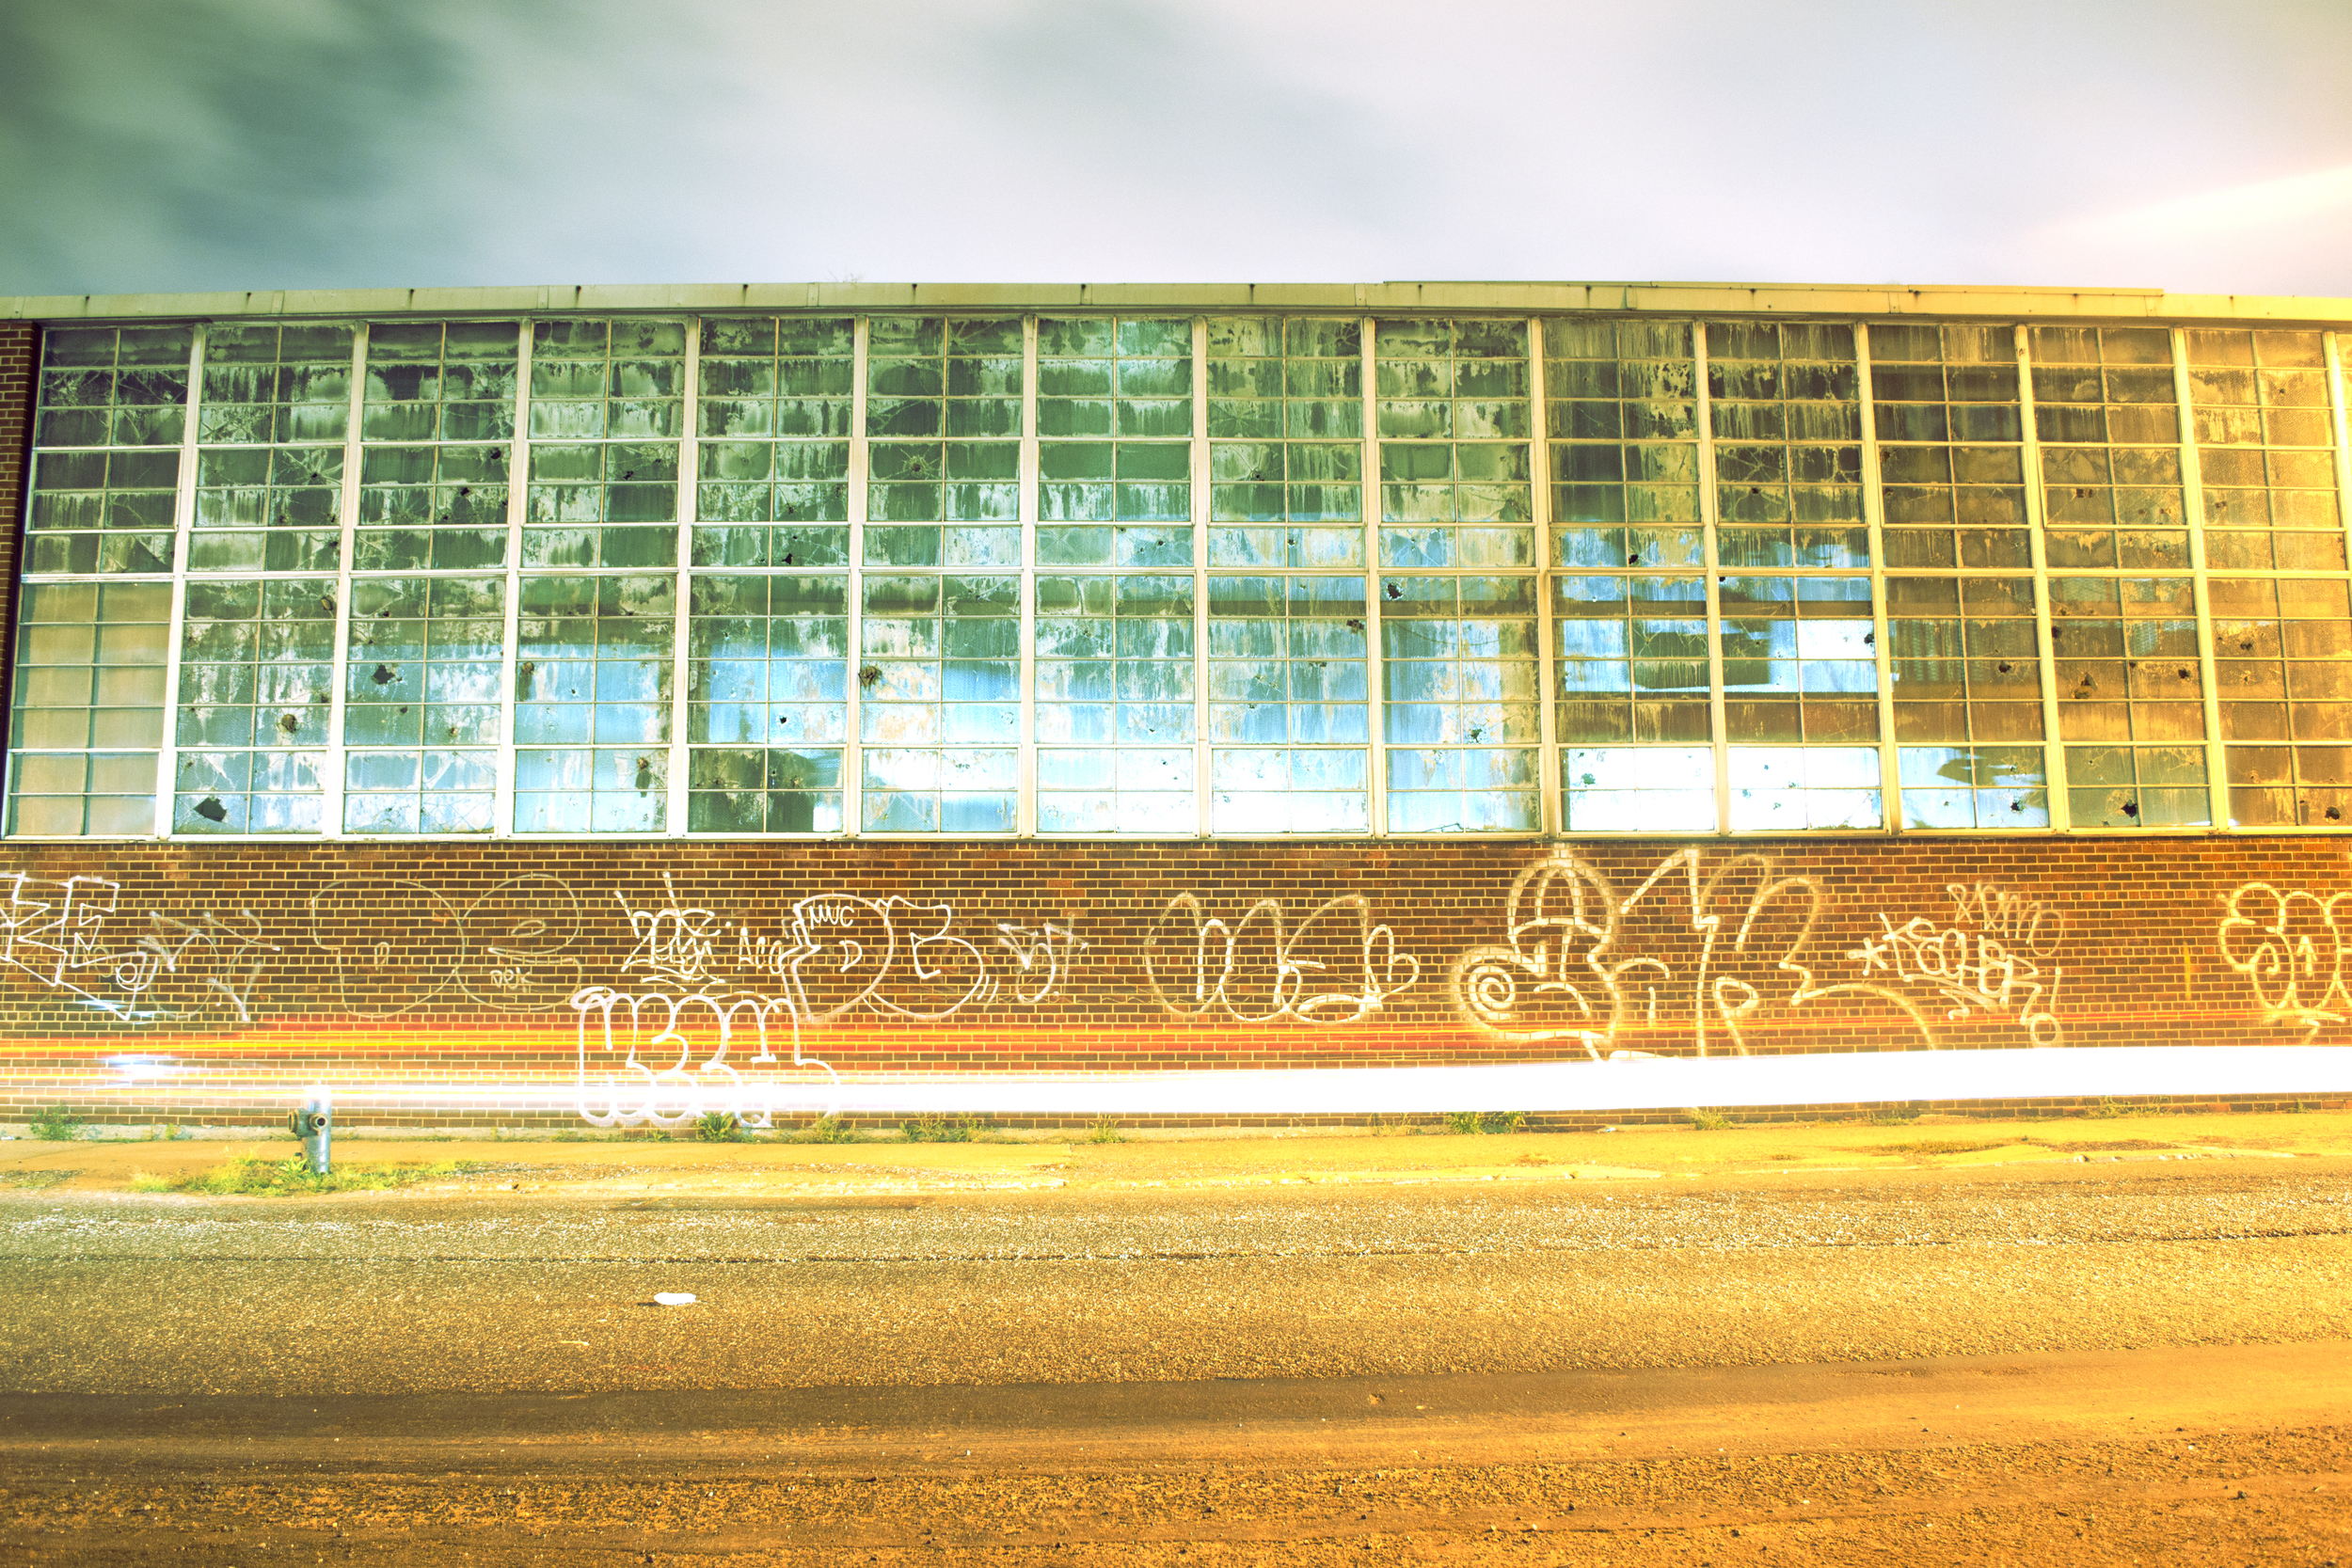 Factory  Bushwick  2011